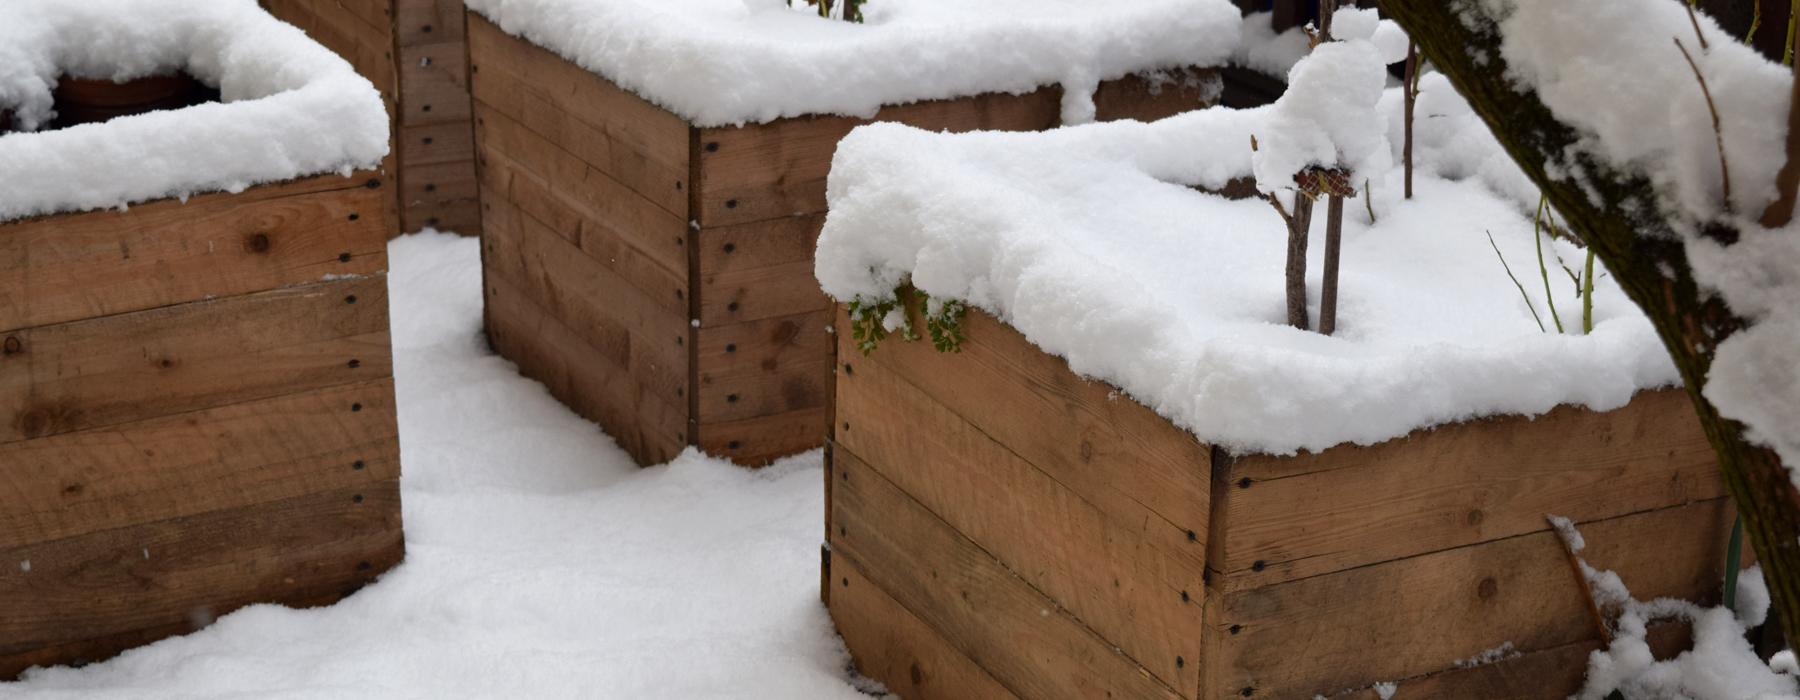 de curae   tiny urban garden in wintertime – Thorsten Schlesinger